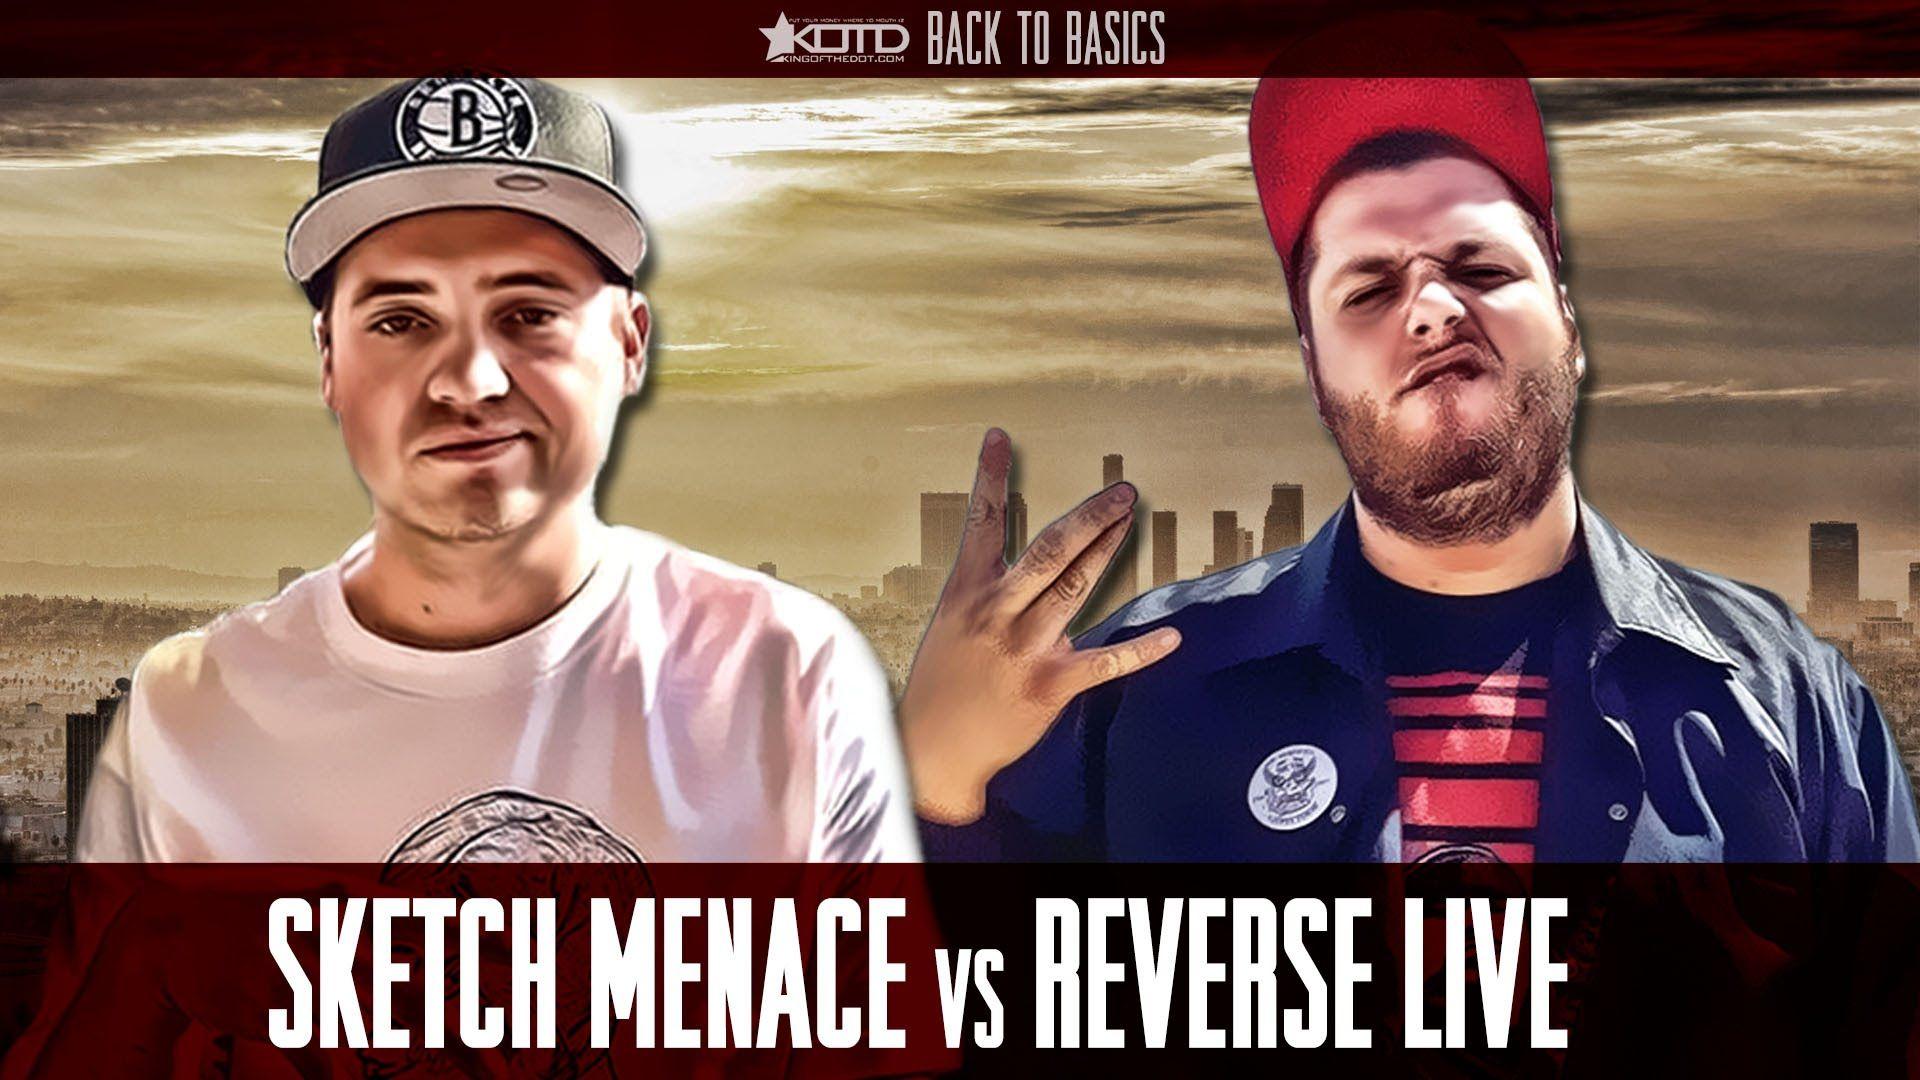 KOTD - Rap Battle - Sketch Menace vs Reverse Live   Hip-Hop